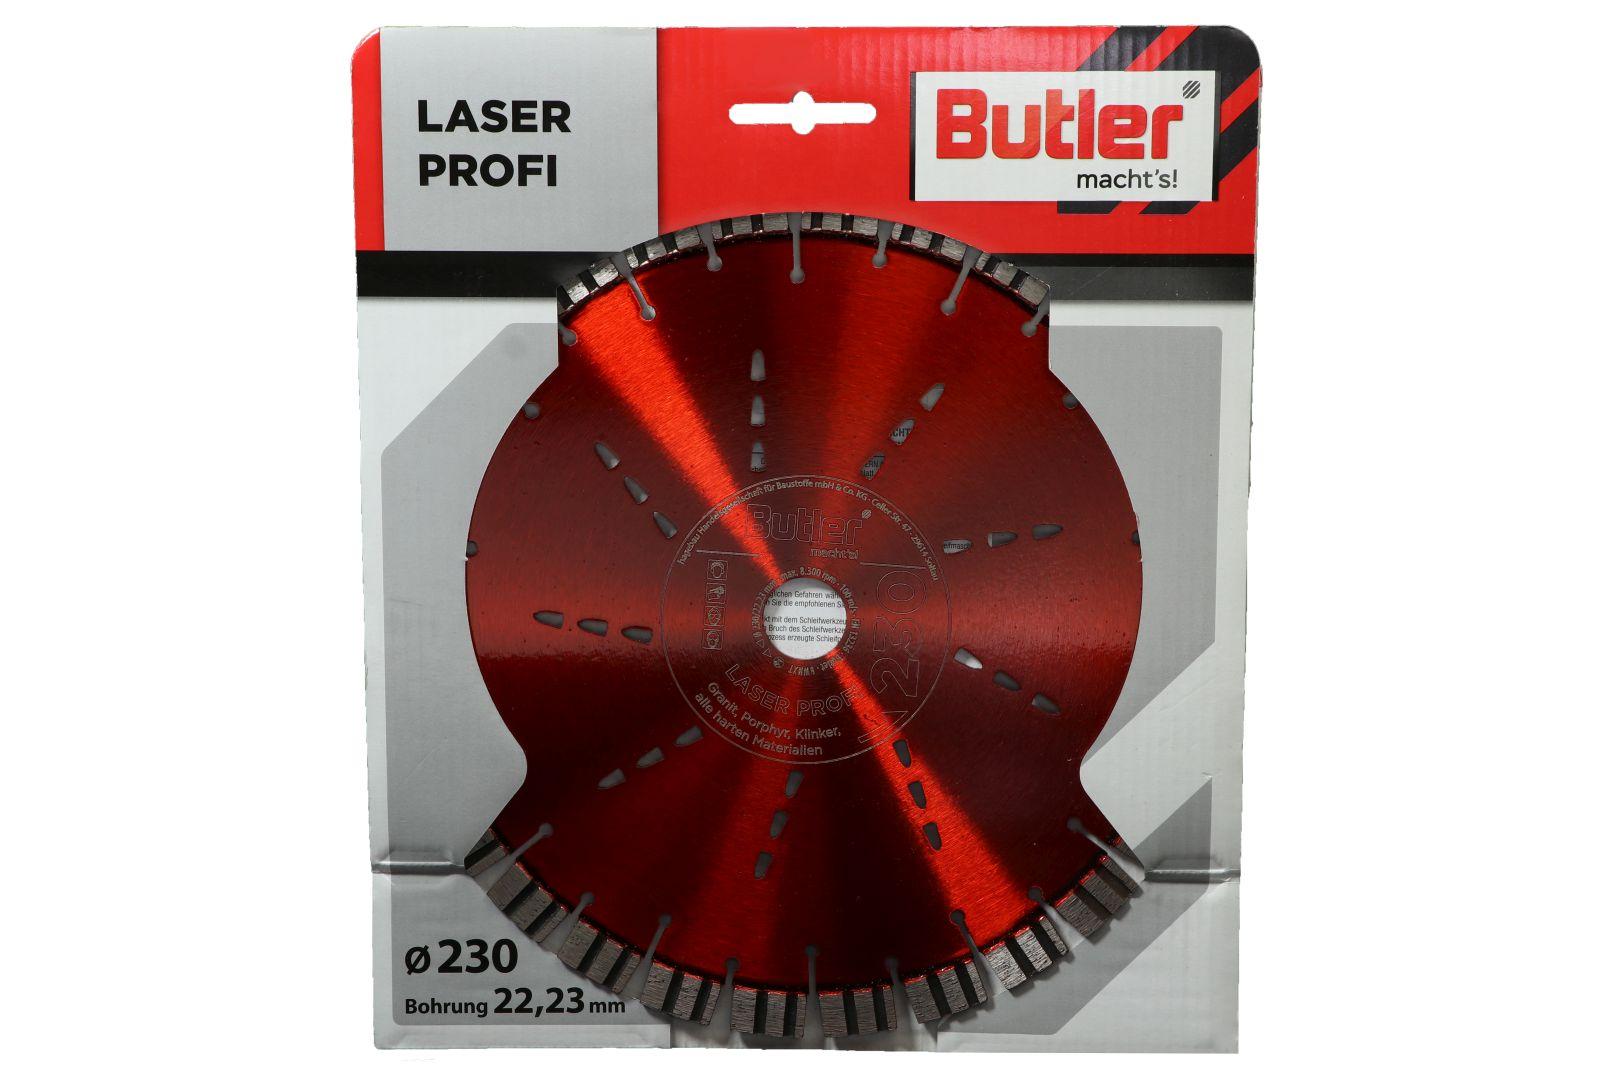 Butler macht's! Diamant-Trennscheibe Laser Profi, Bohrung: 22,23 mm, Ø 230 mm